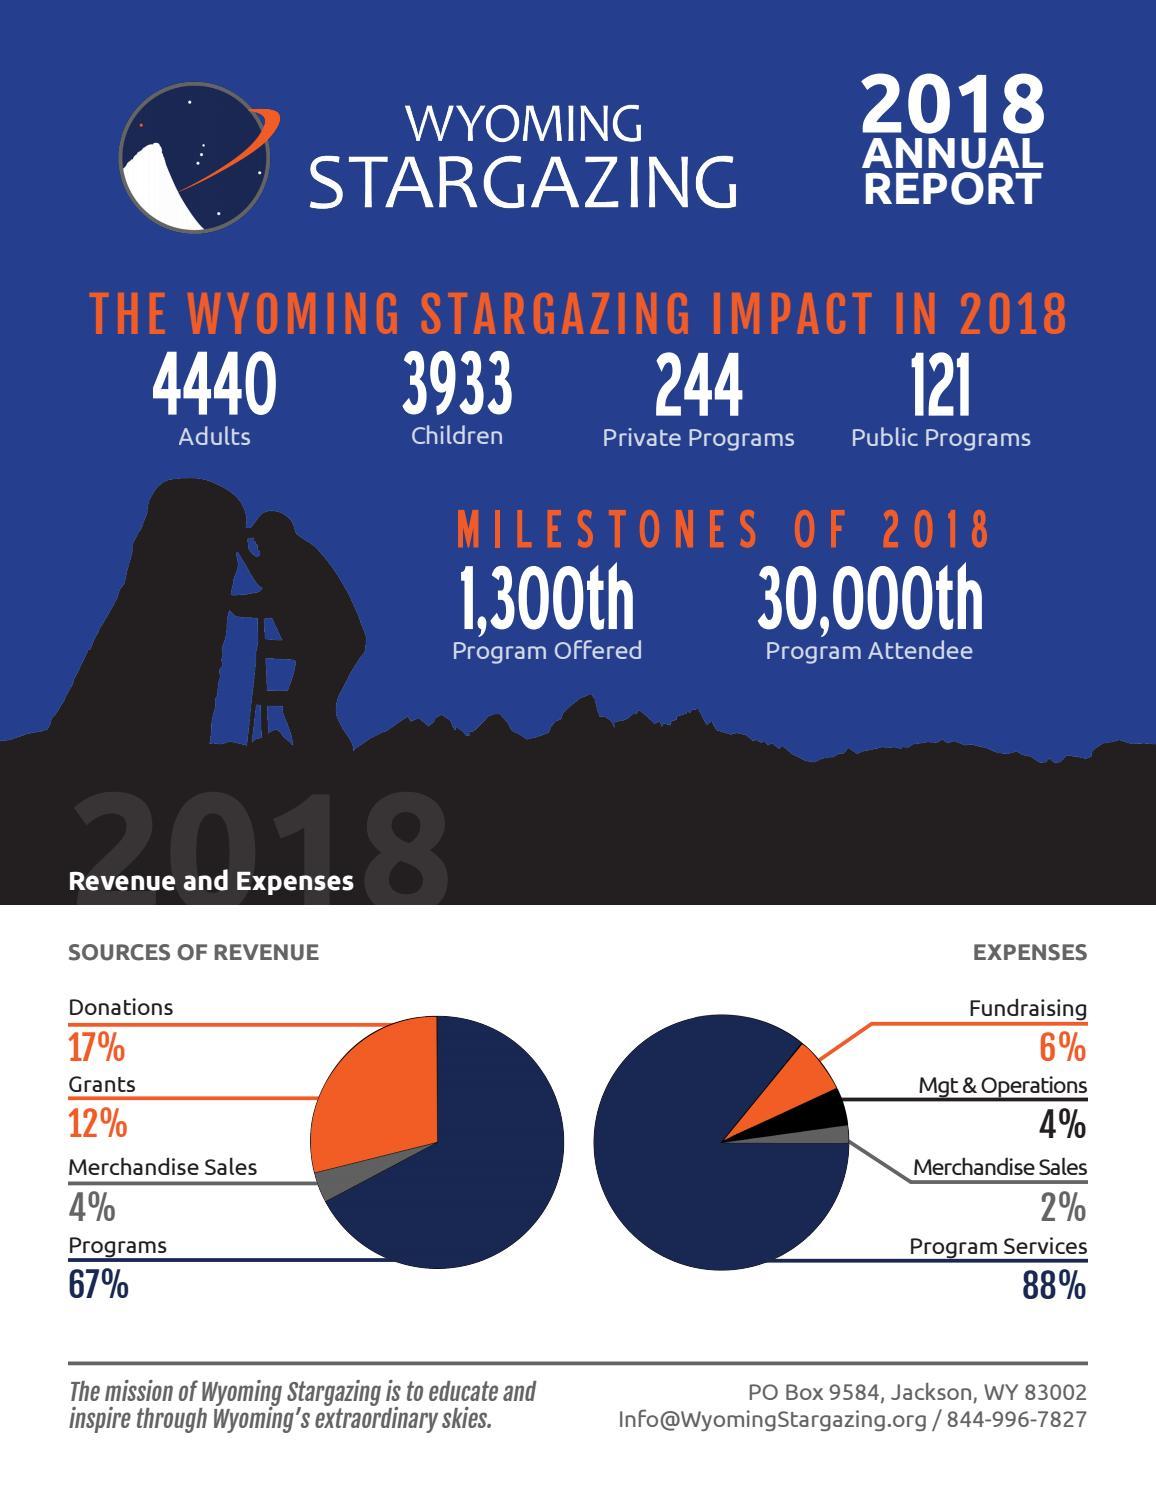 Wyoming Stargazing Annual Report 2018 (September 2017 - August 2018